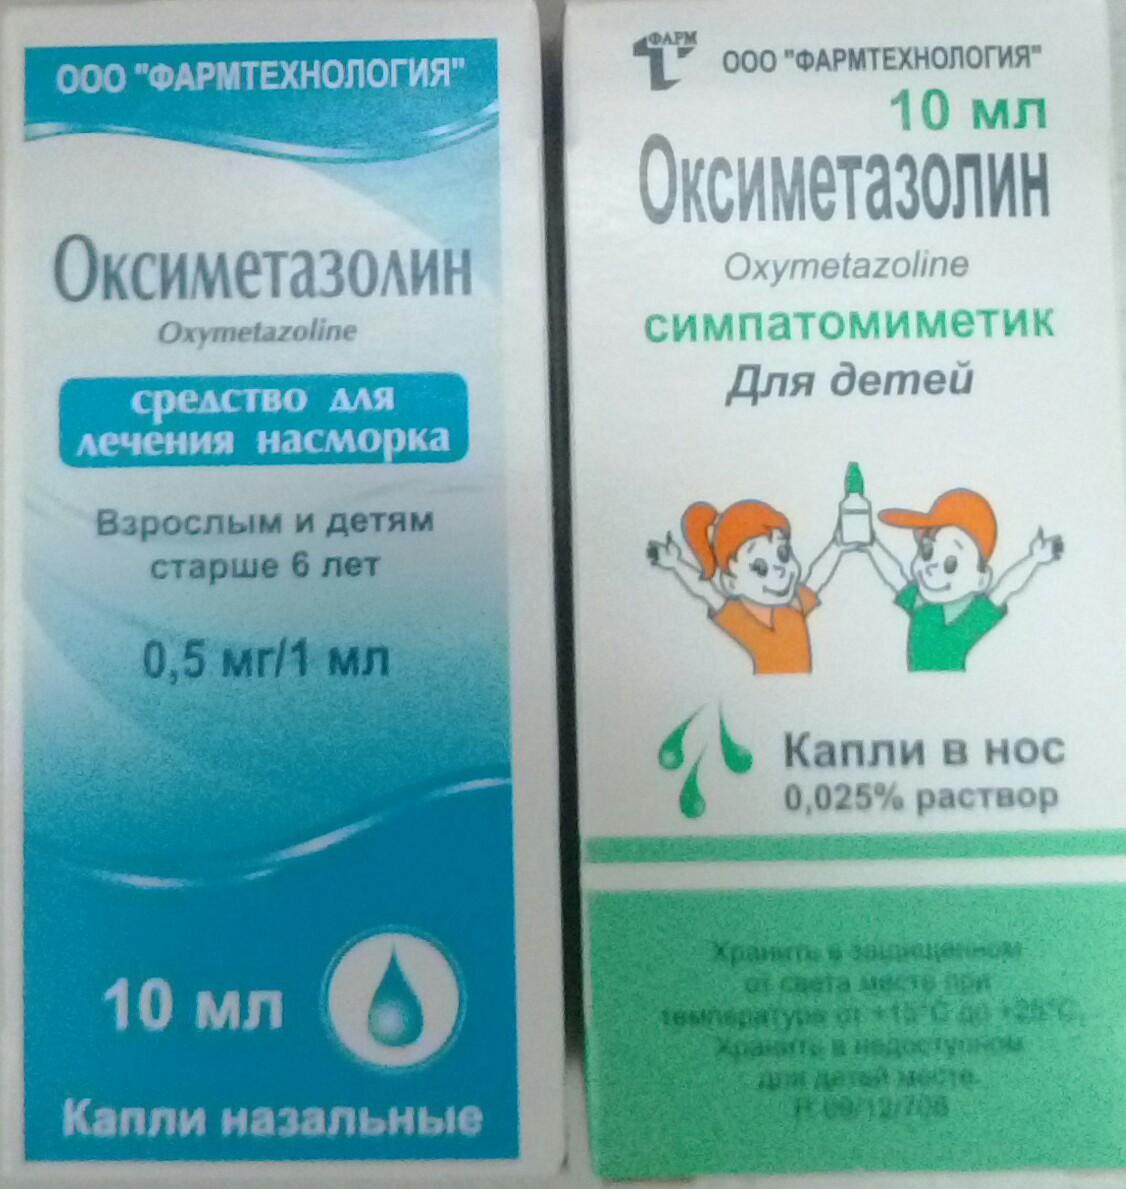 Оксиметазолин капли в нос